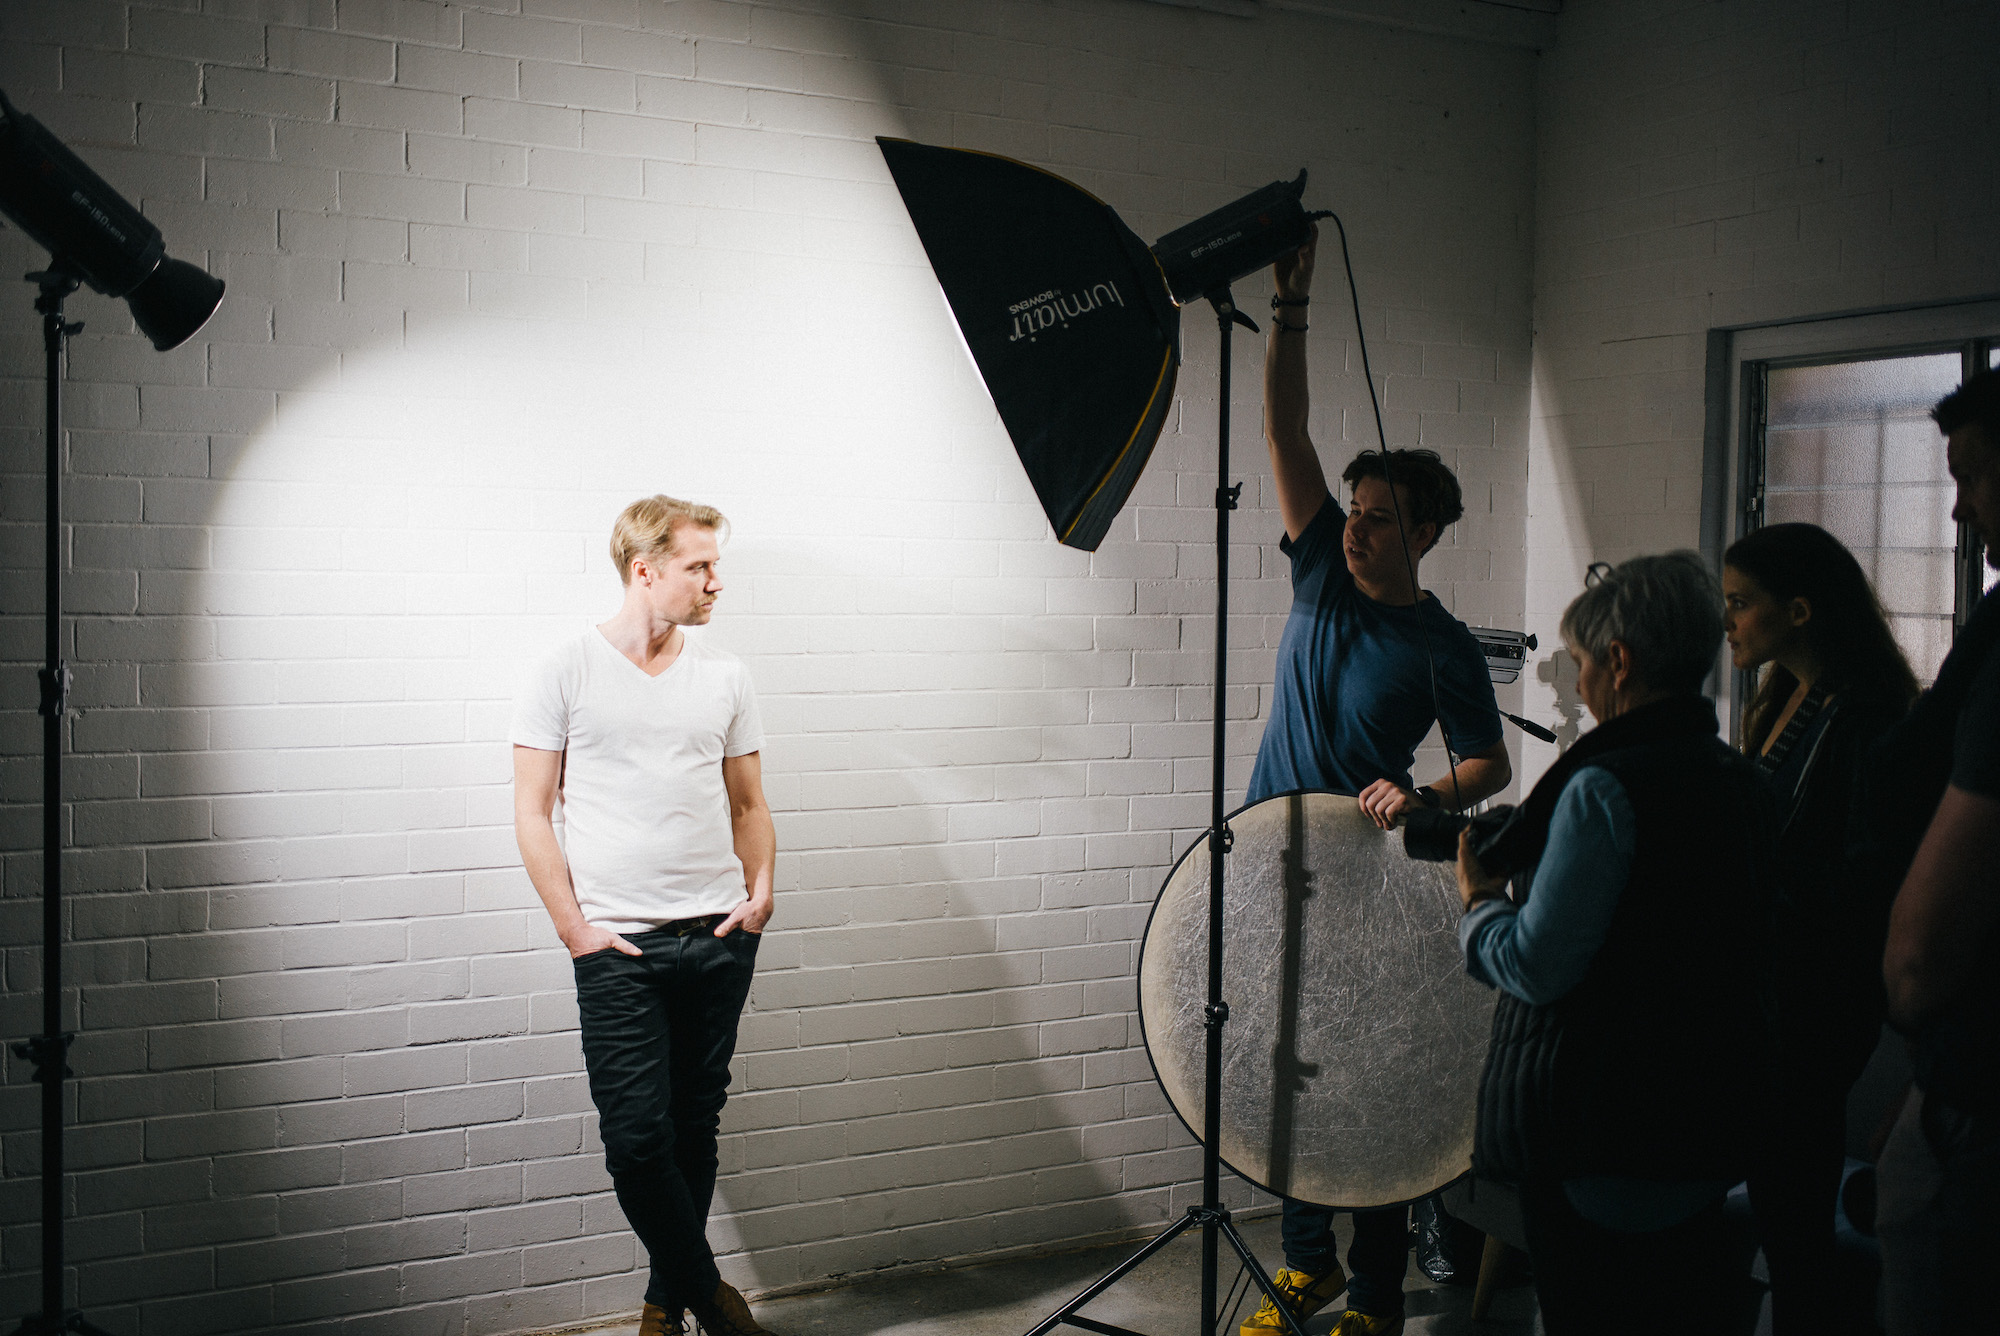 20170715__005622-Nick-Bedford,-Photographer-Leica M Typ 240, Portrait, Robin Anthony Darch, Tyler Alberti, Voigtlander 35mm F1.7 Ultron Asph, VSCO Film.jpg